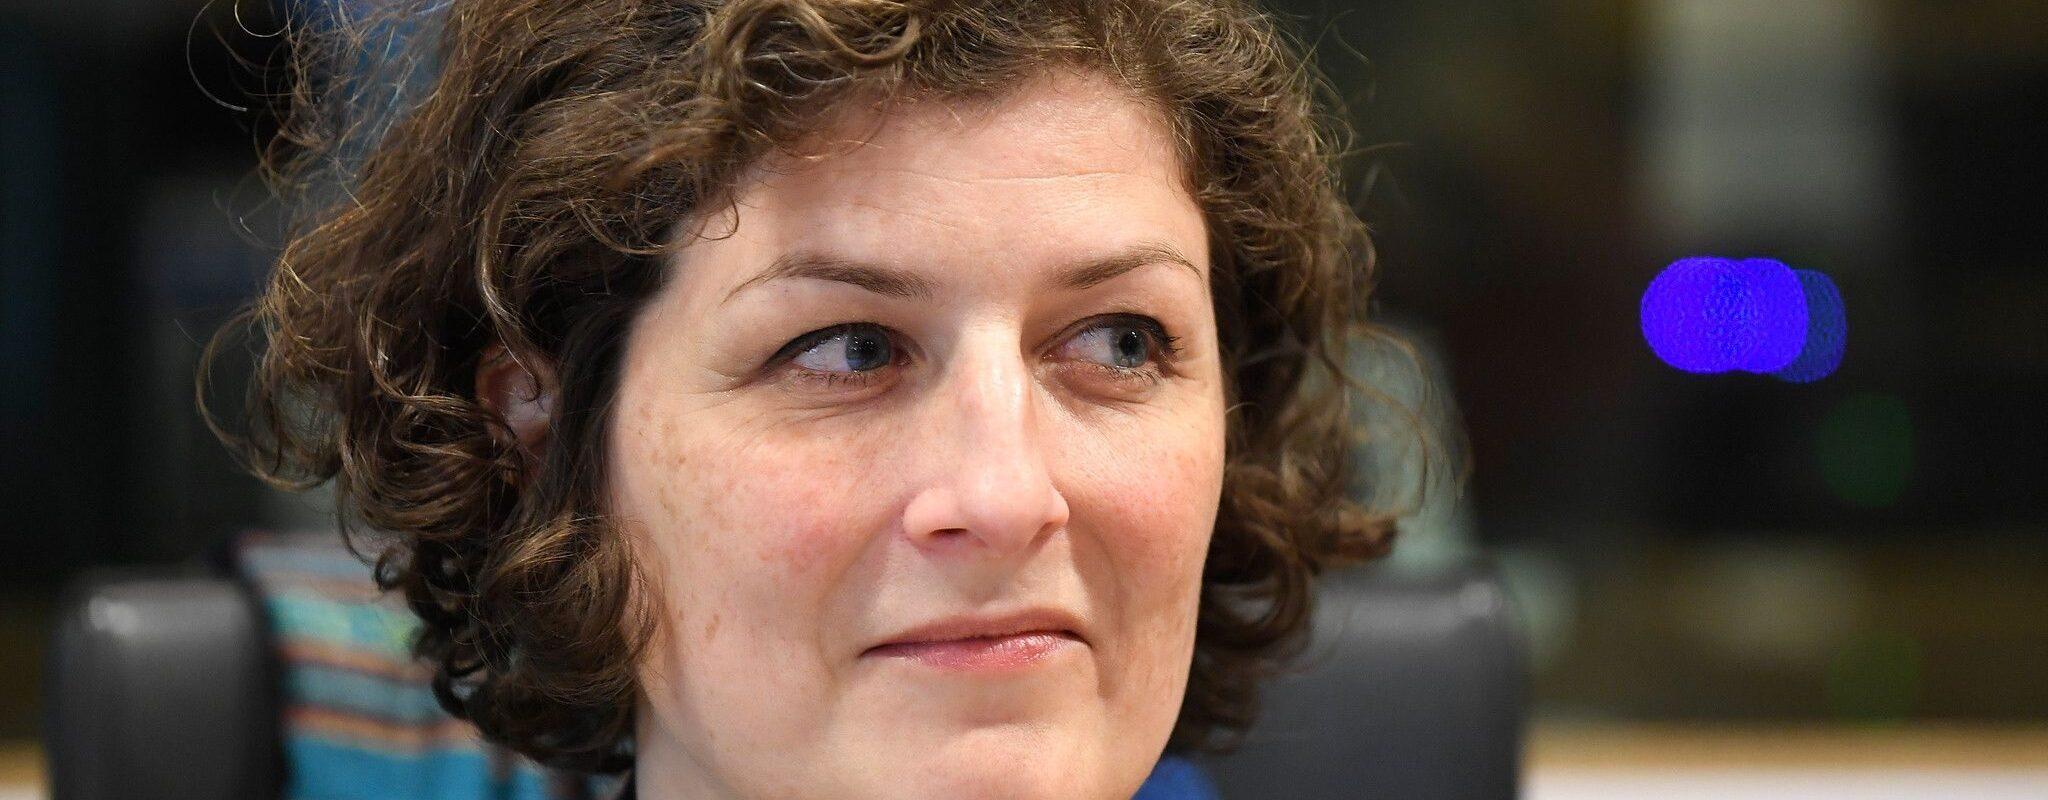 Jeanne Barseghian prête à accueillir des réfugiés afghans, Strasbourg moins